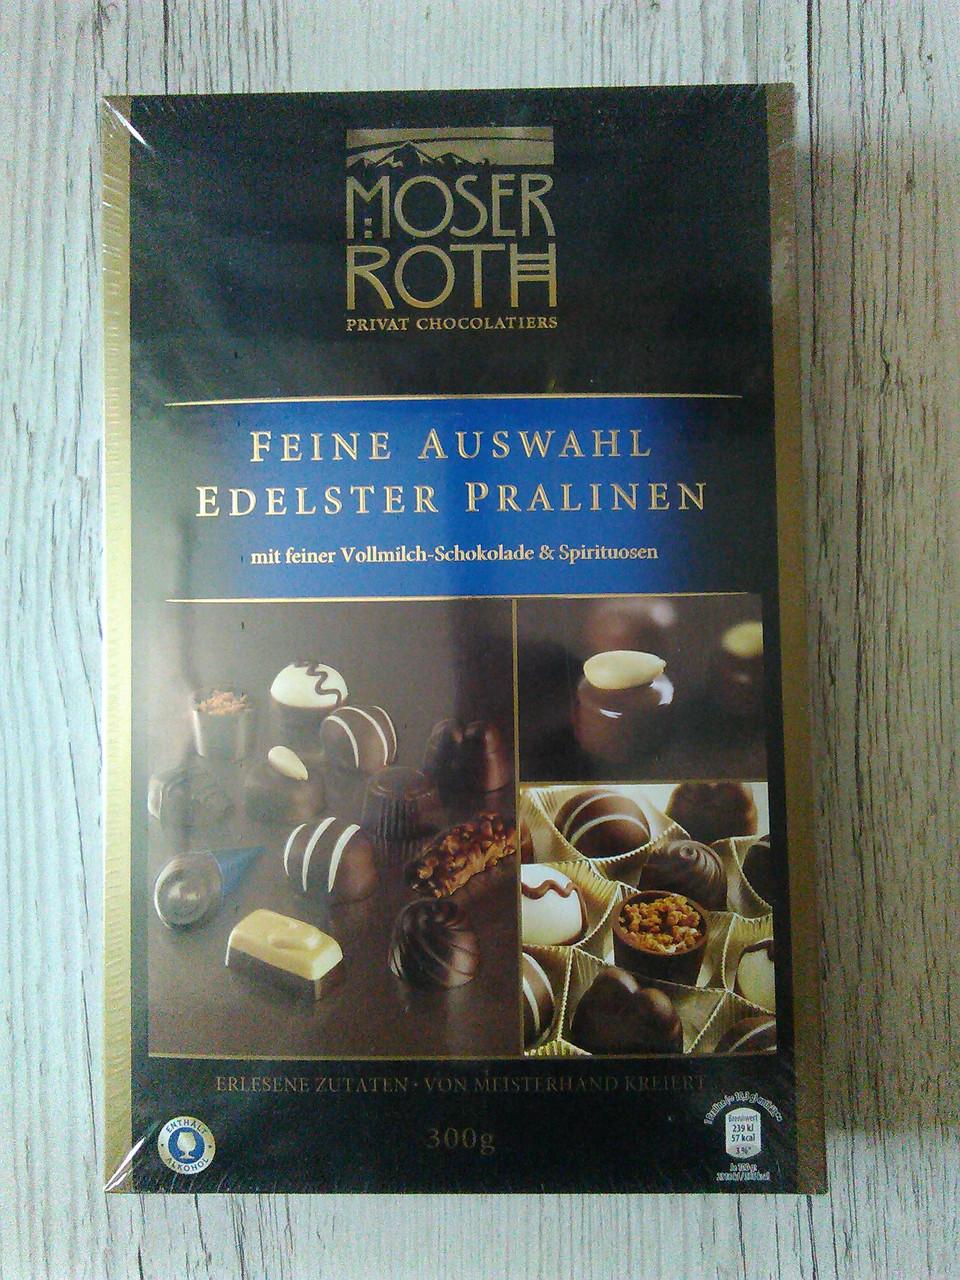 Конфеты в коробке Moser Roth из молочного шоколада ассорти, 300 гр